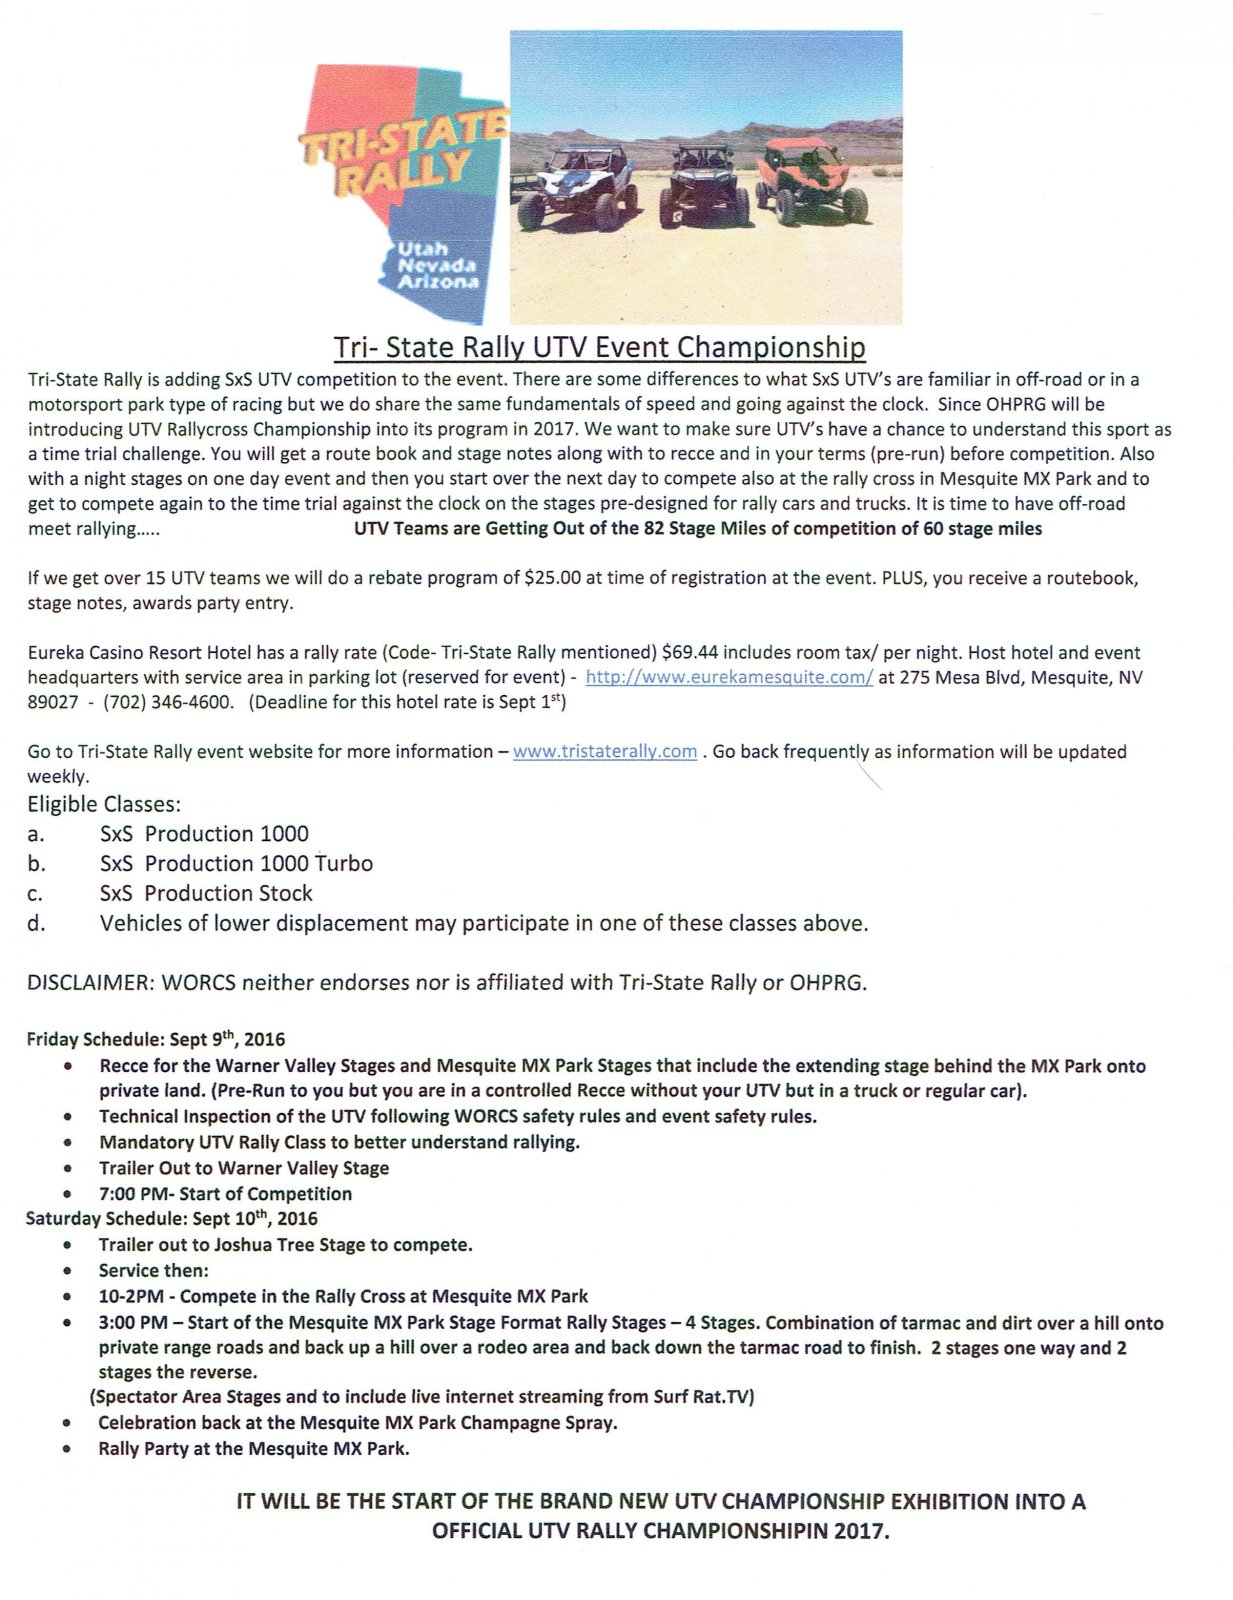 UTV Flyer Championship_Page_1_Image_0001.jpg